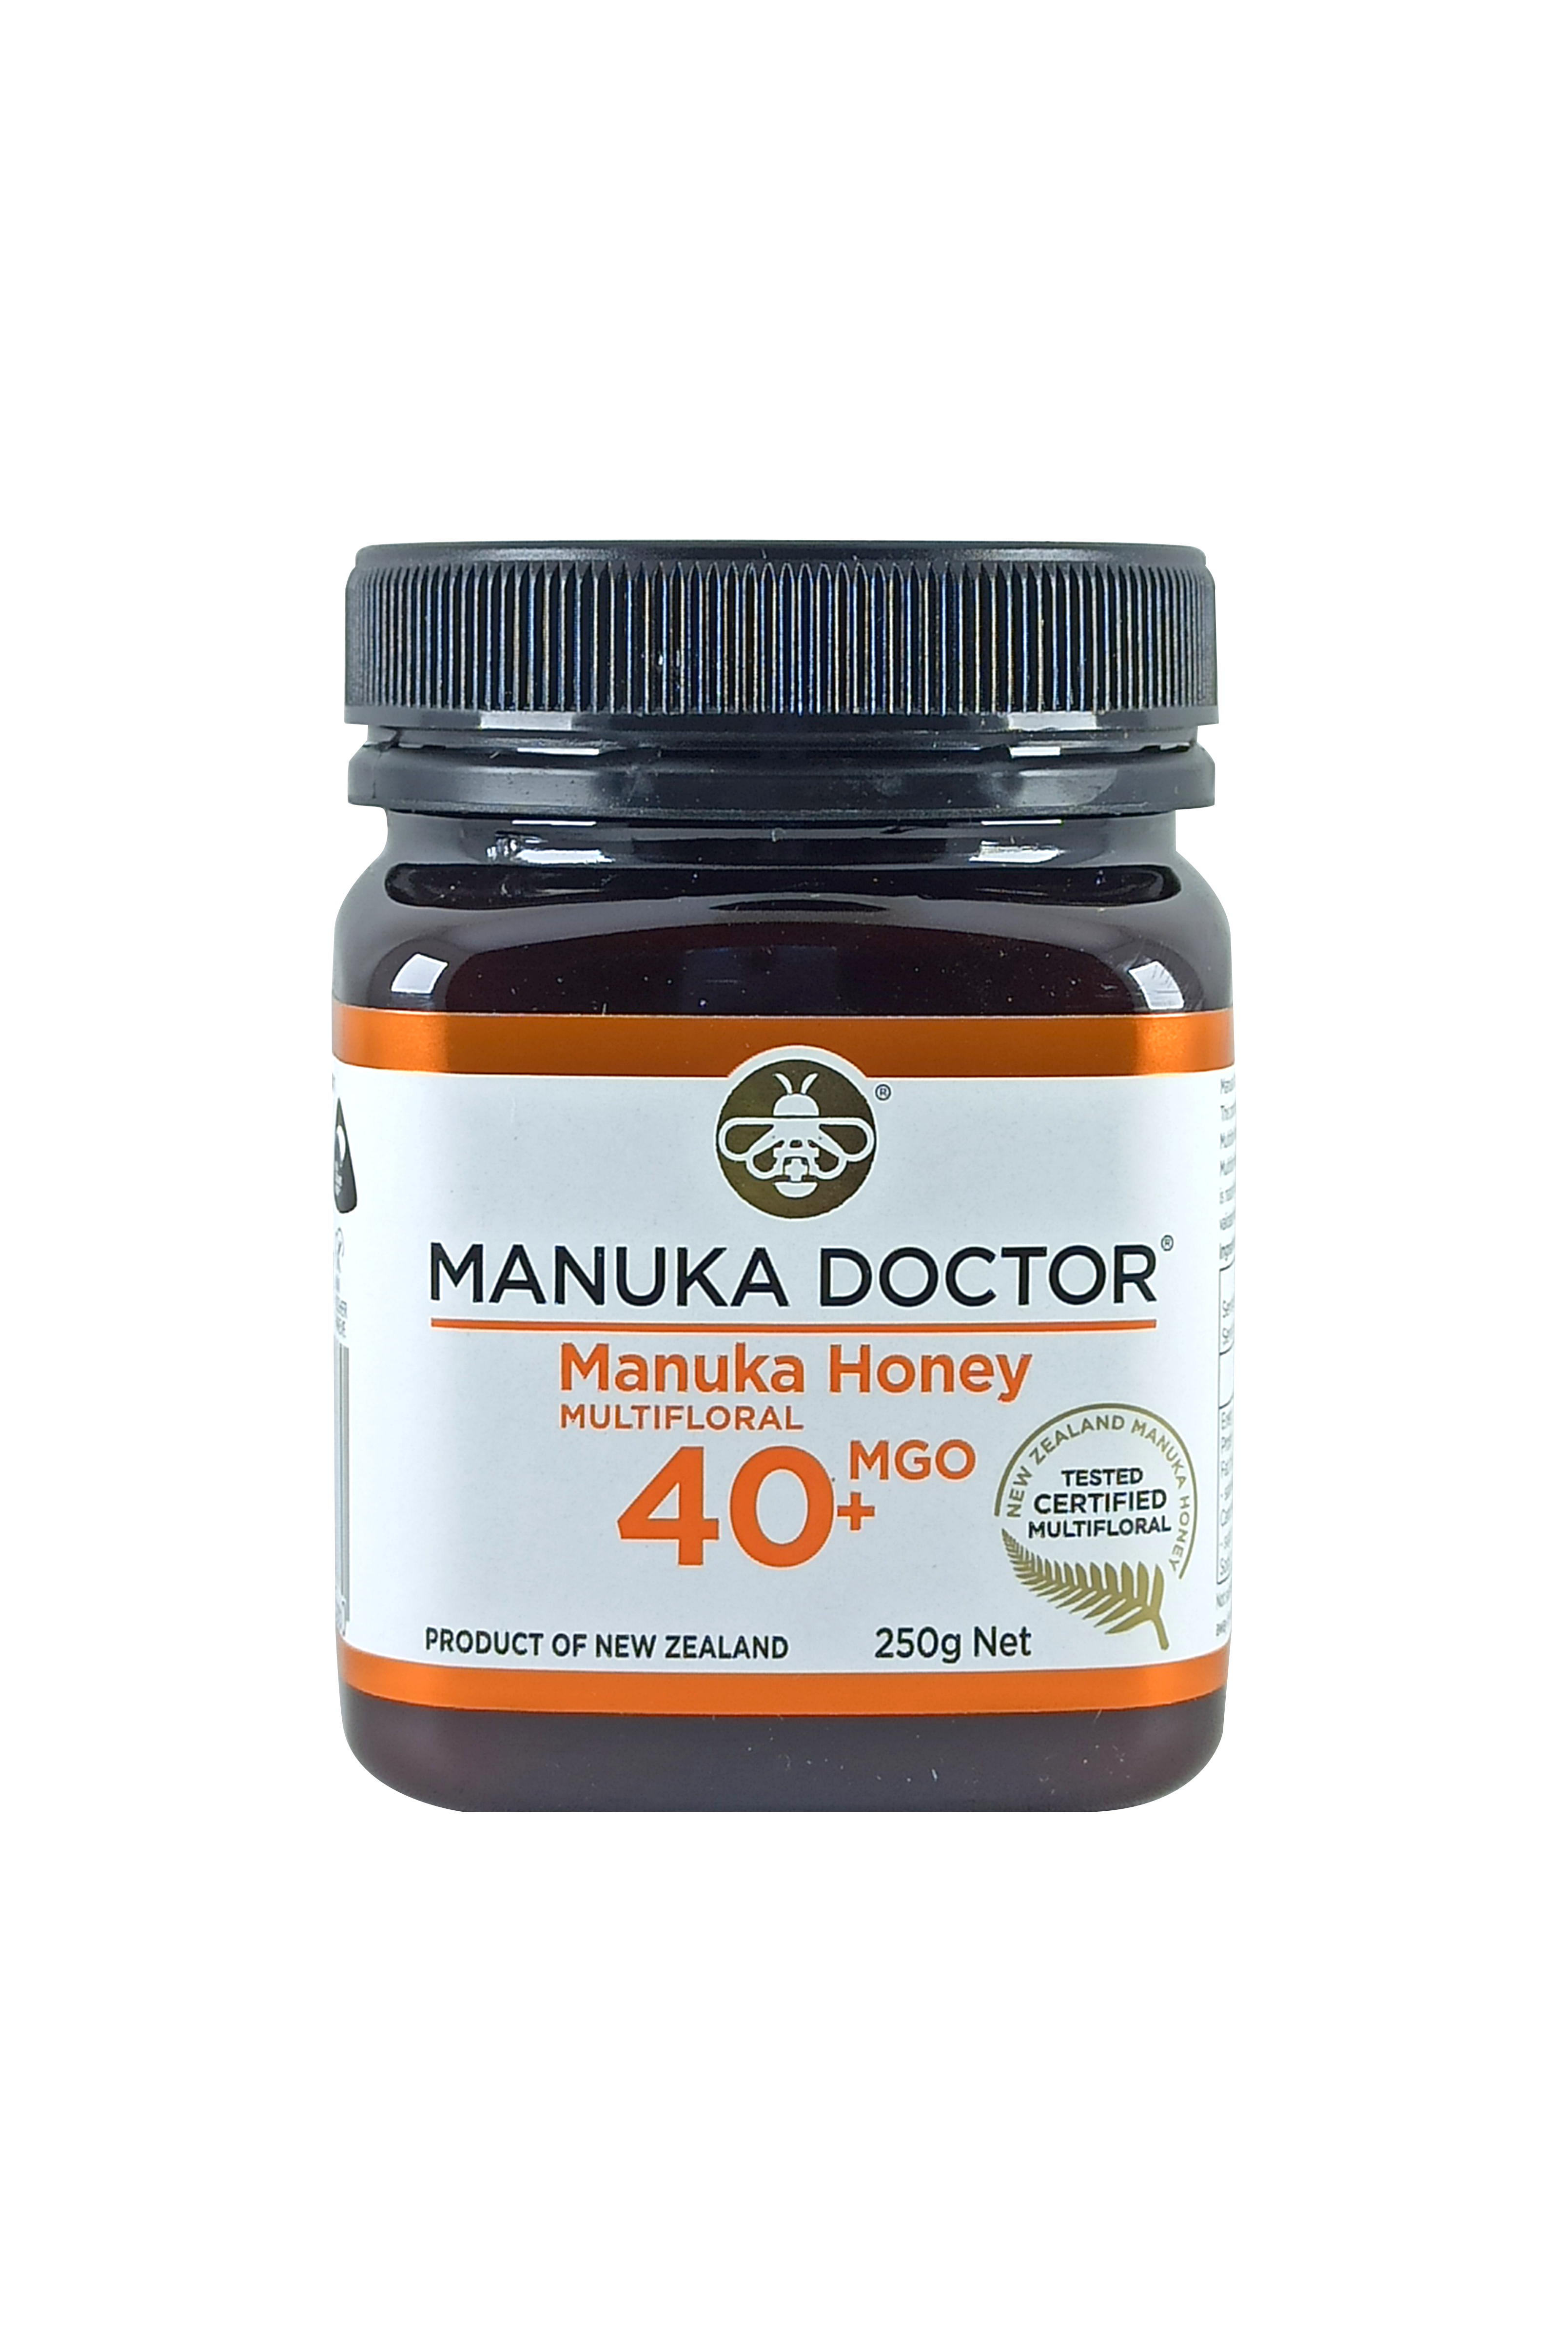 Manuka Doctor MGO 40+ Manuka Honey Multifloral 250gr